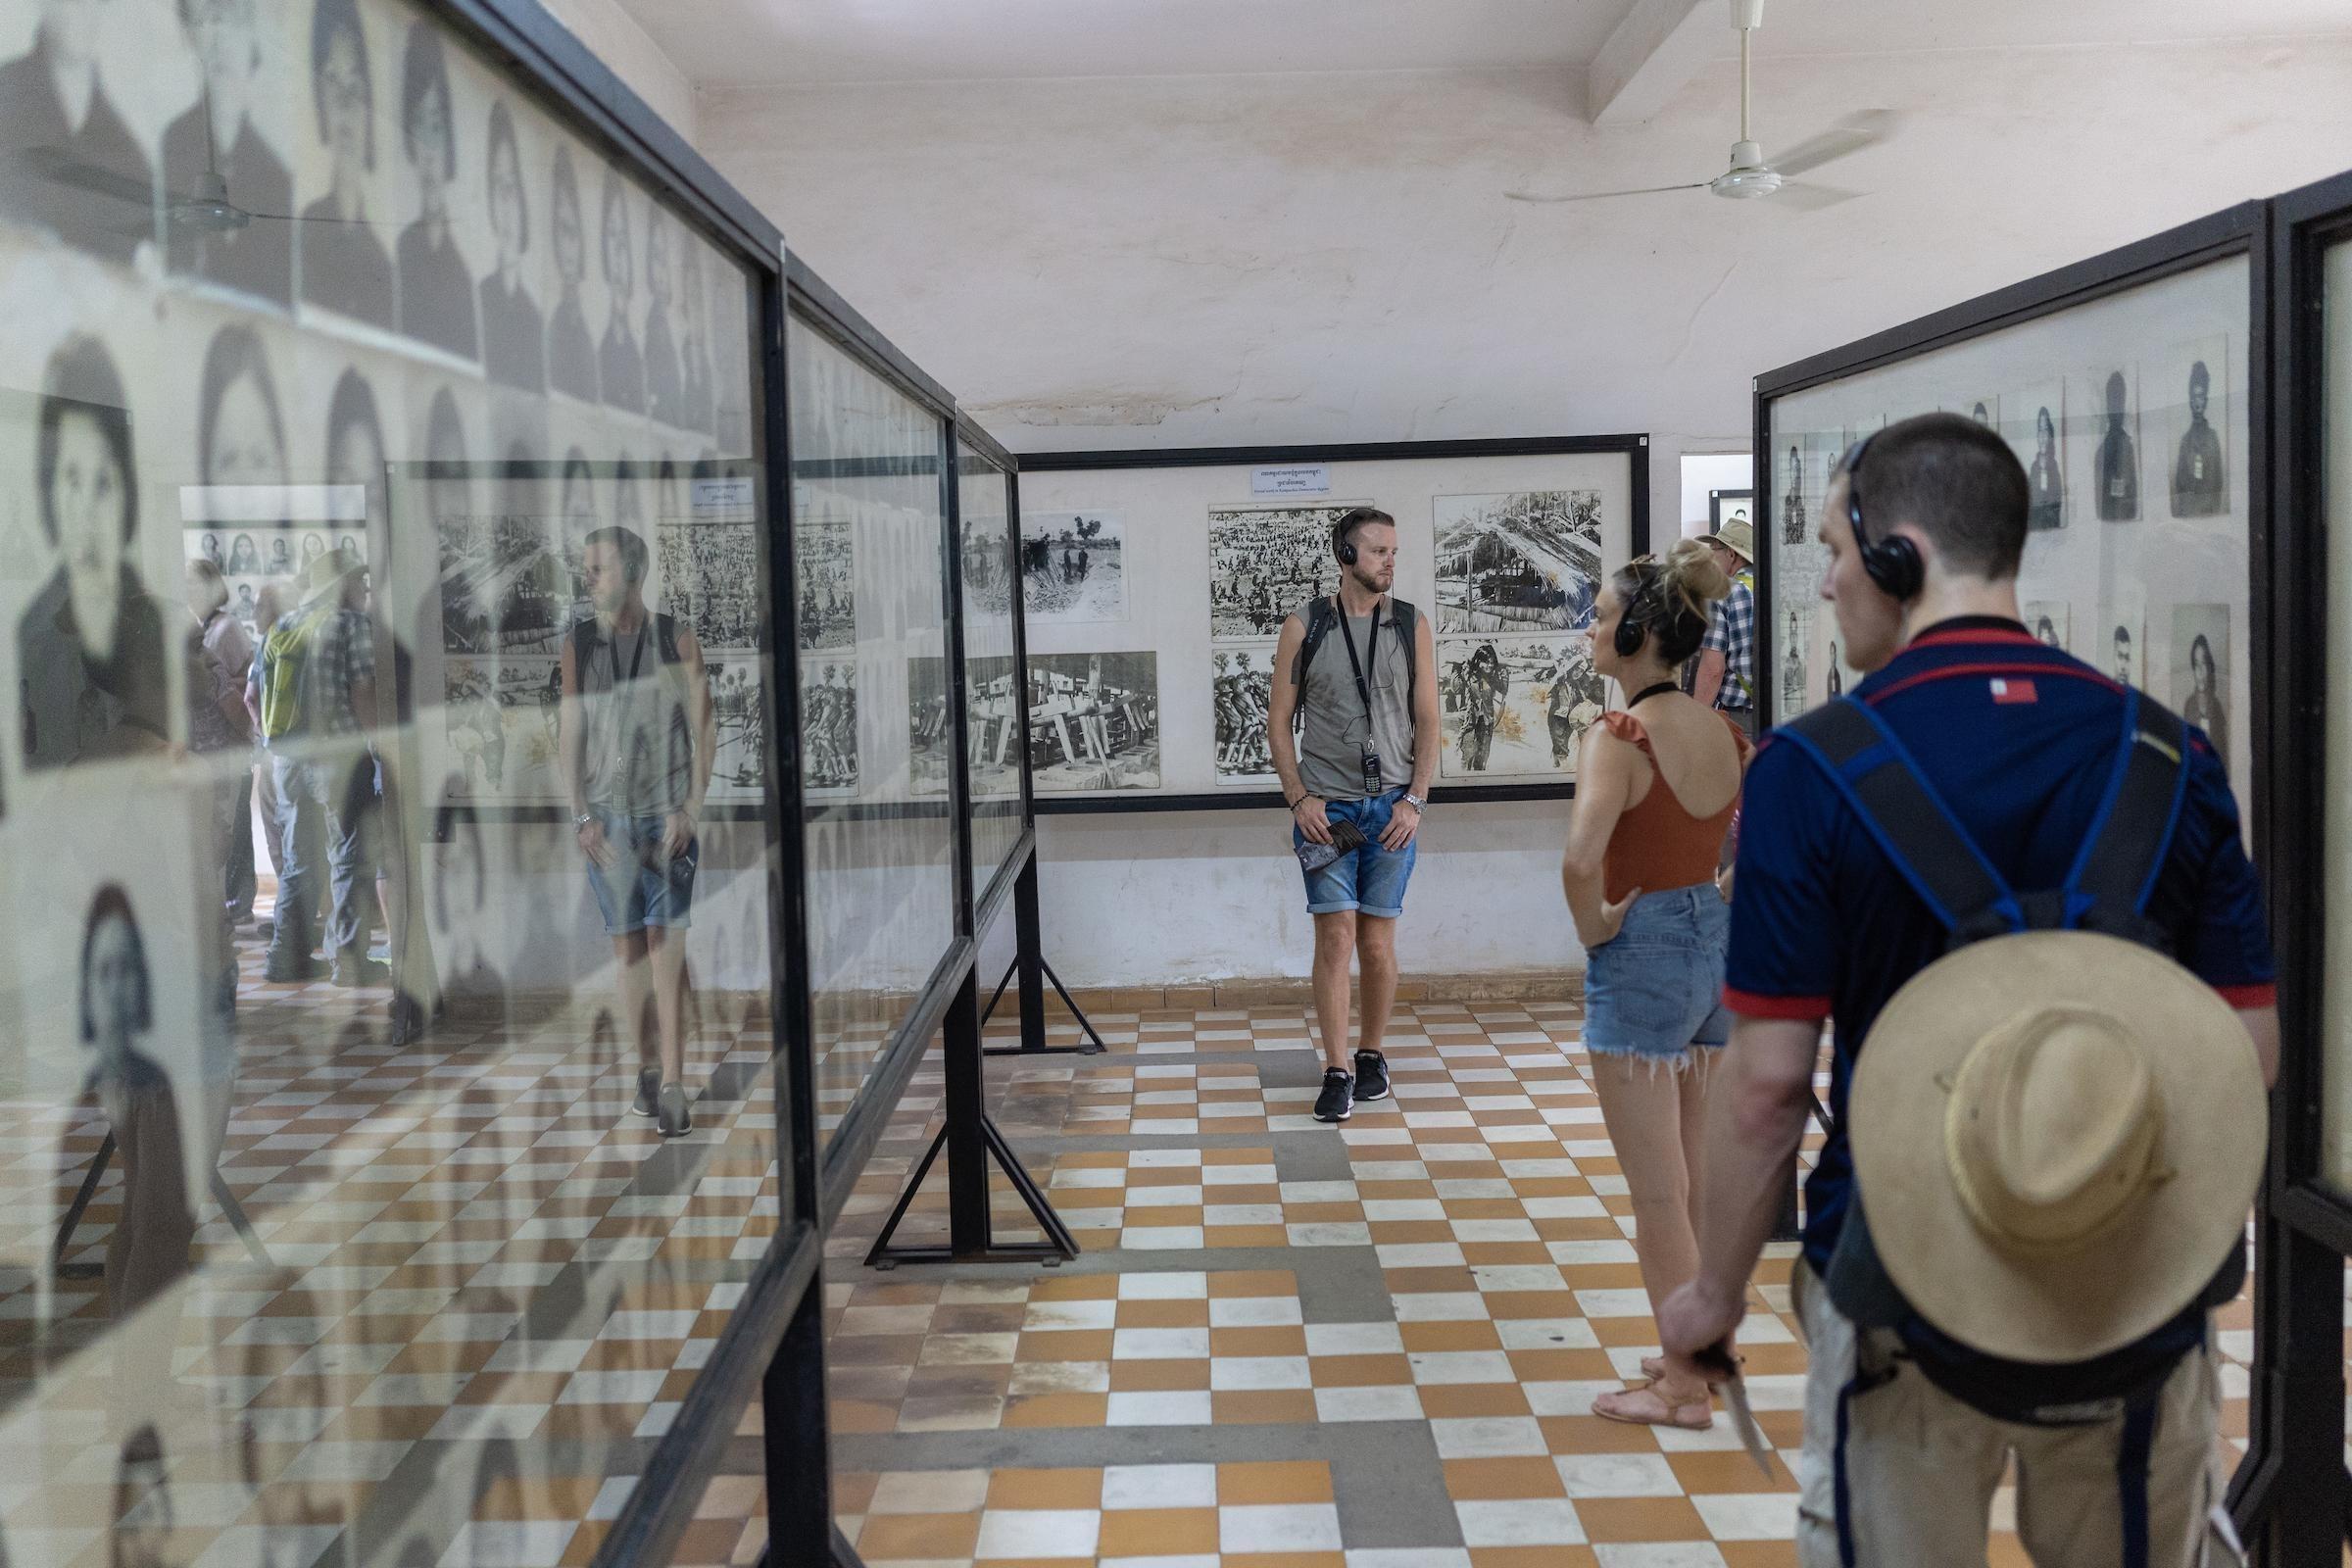 Khmer Rouge Sites in Phnom Penh